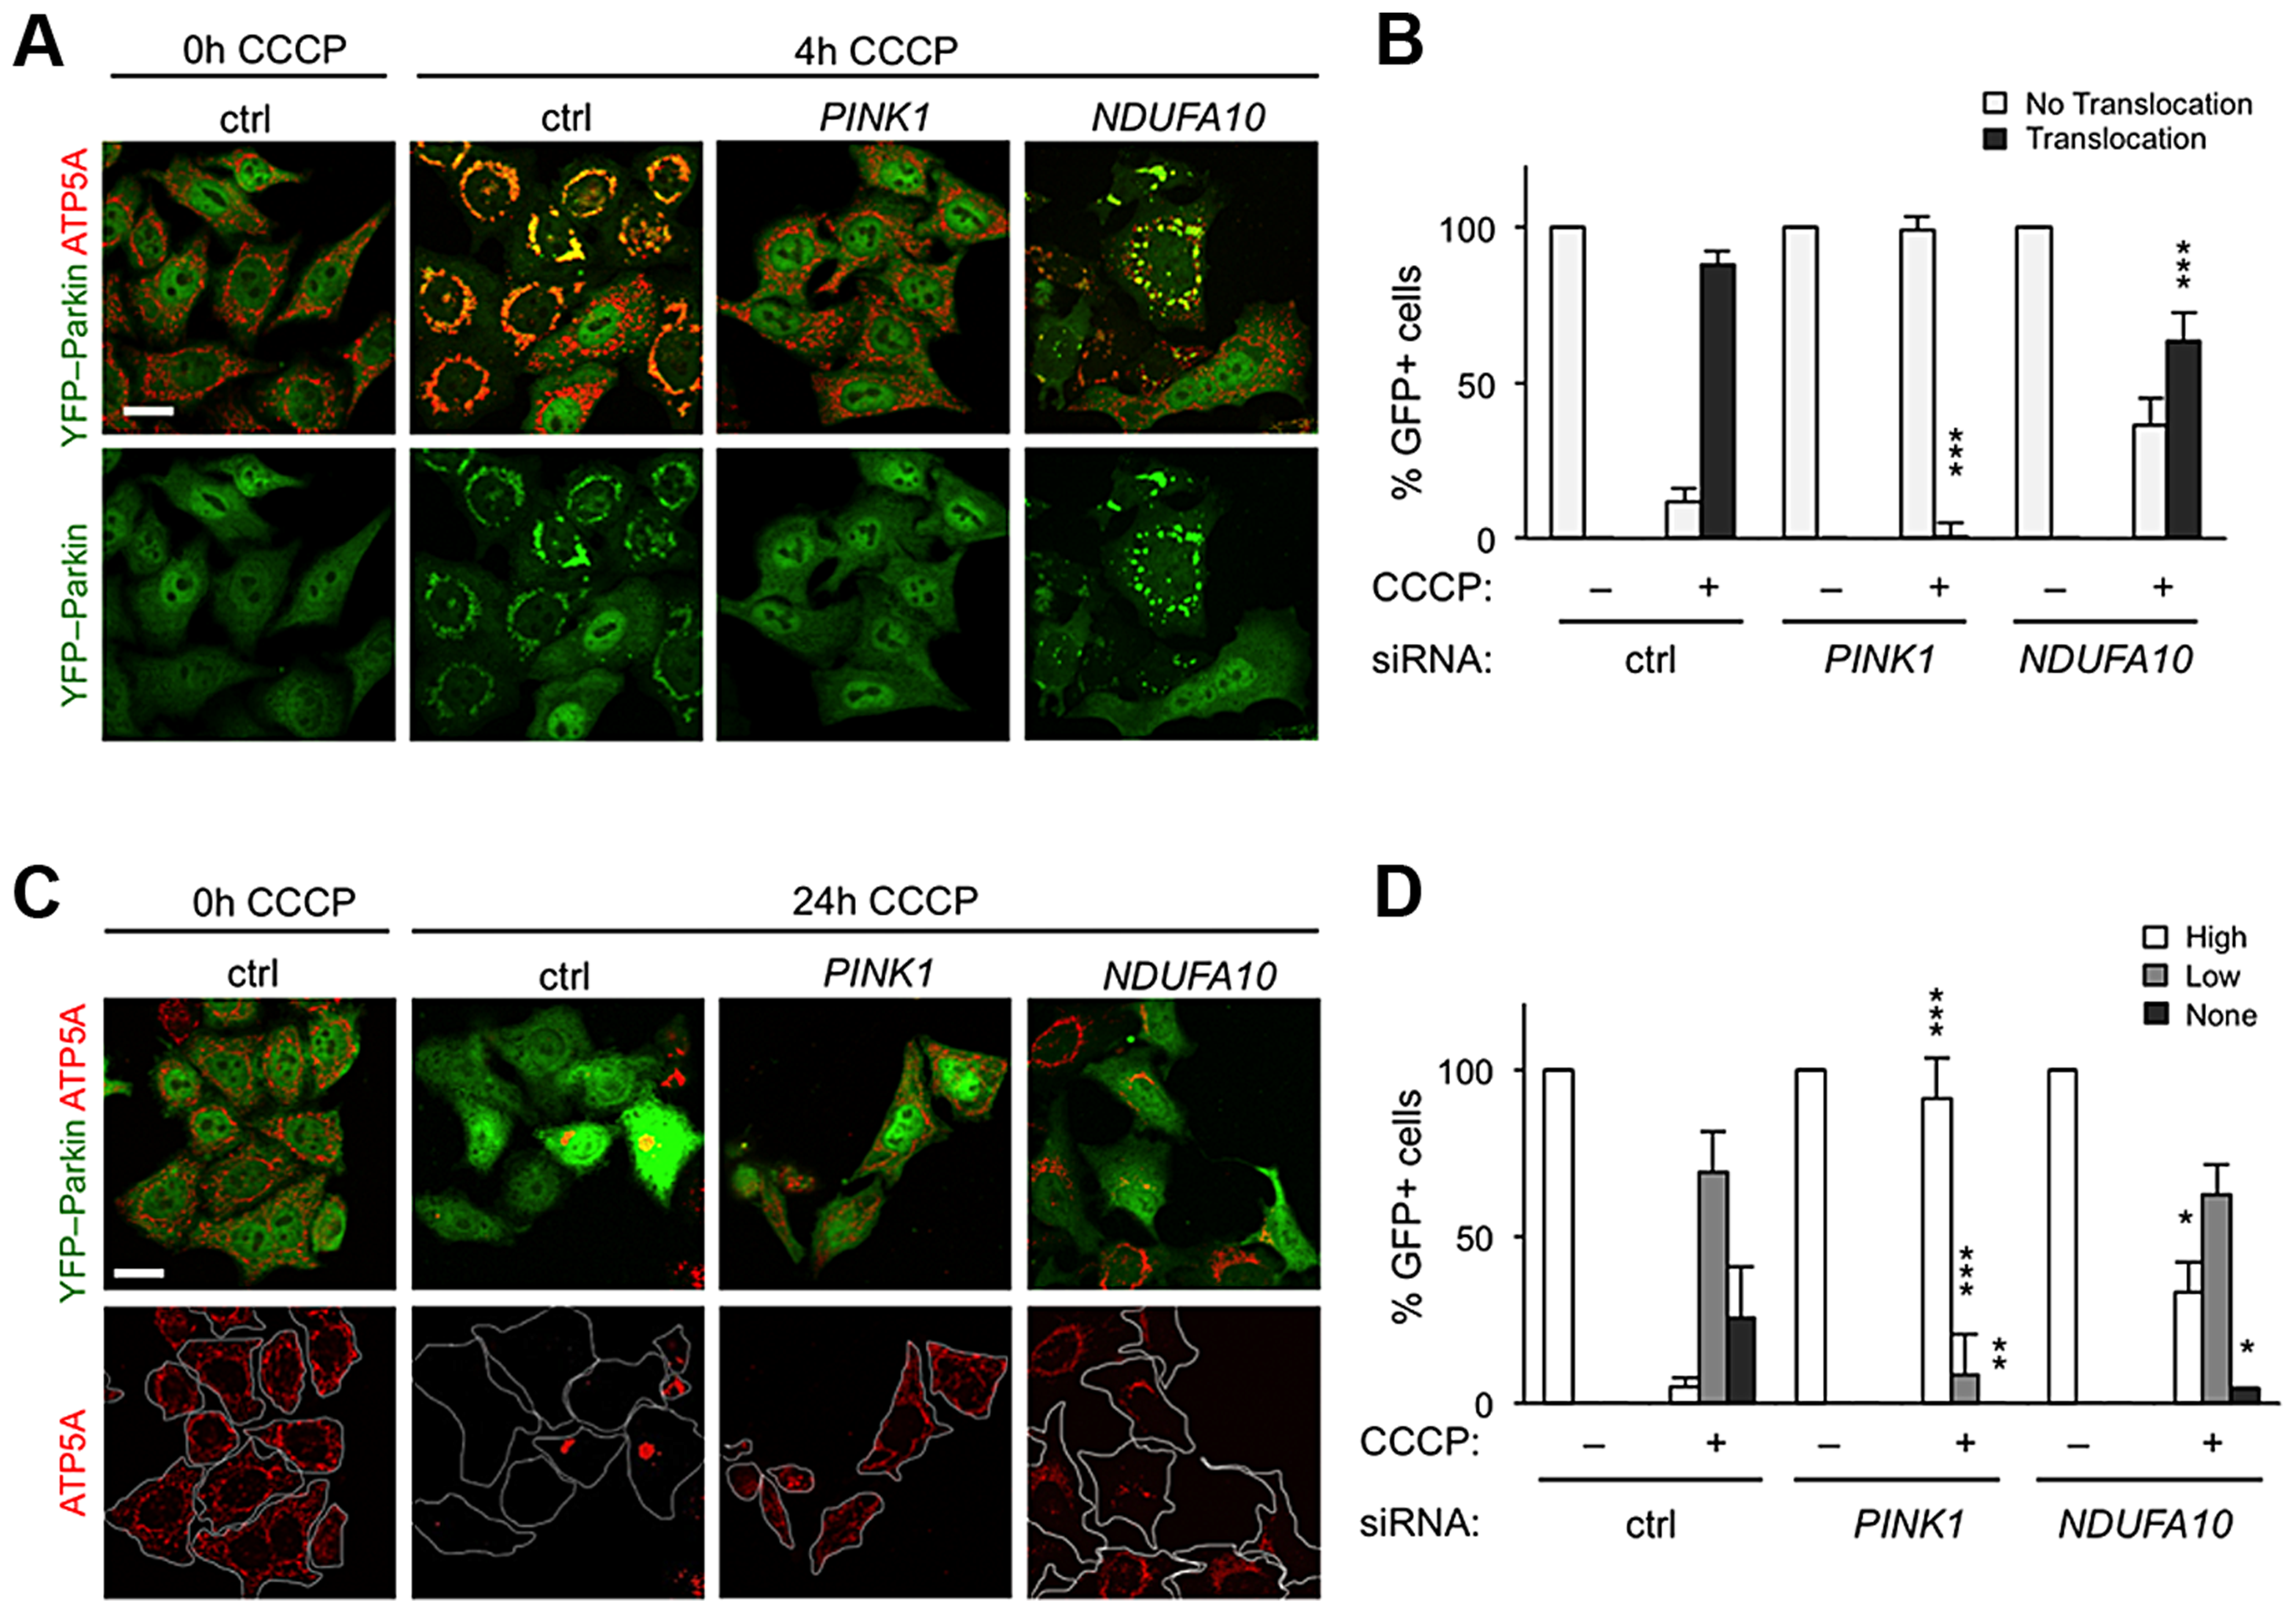 <i>NDUFA10</i> knockdown slightly reduces CCCP-induced Parkin translocation and mitophagy.